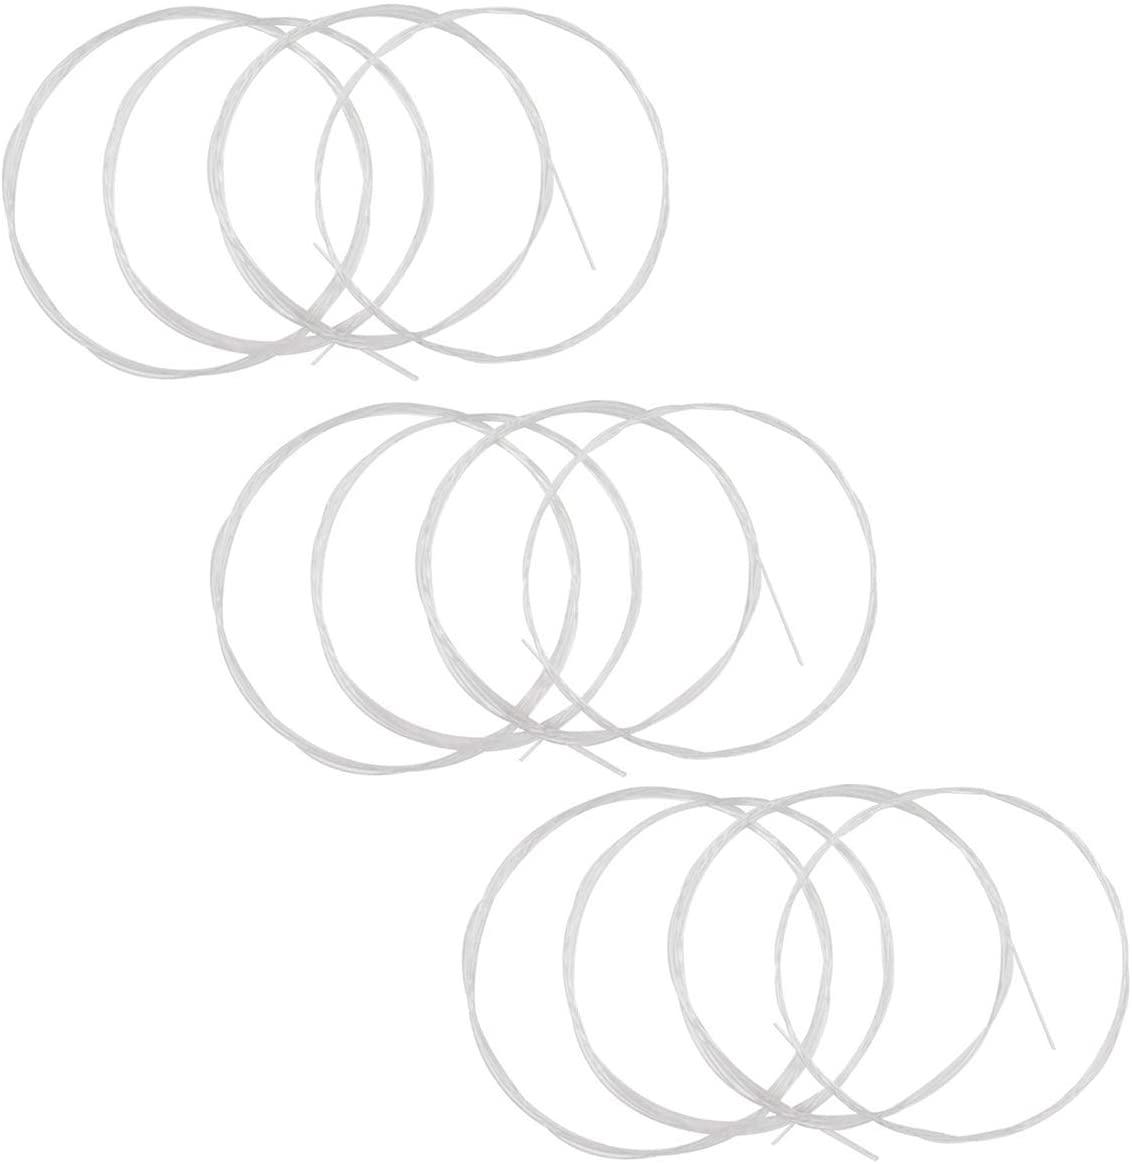 Clear Nylon Ukulele Strings Ukulele Nylon Strings Nylon Ukelele Strings 3 full sets